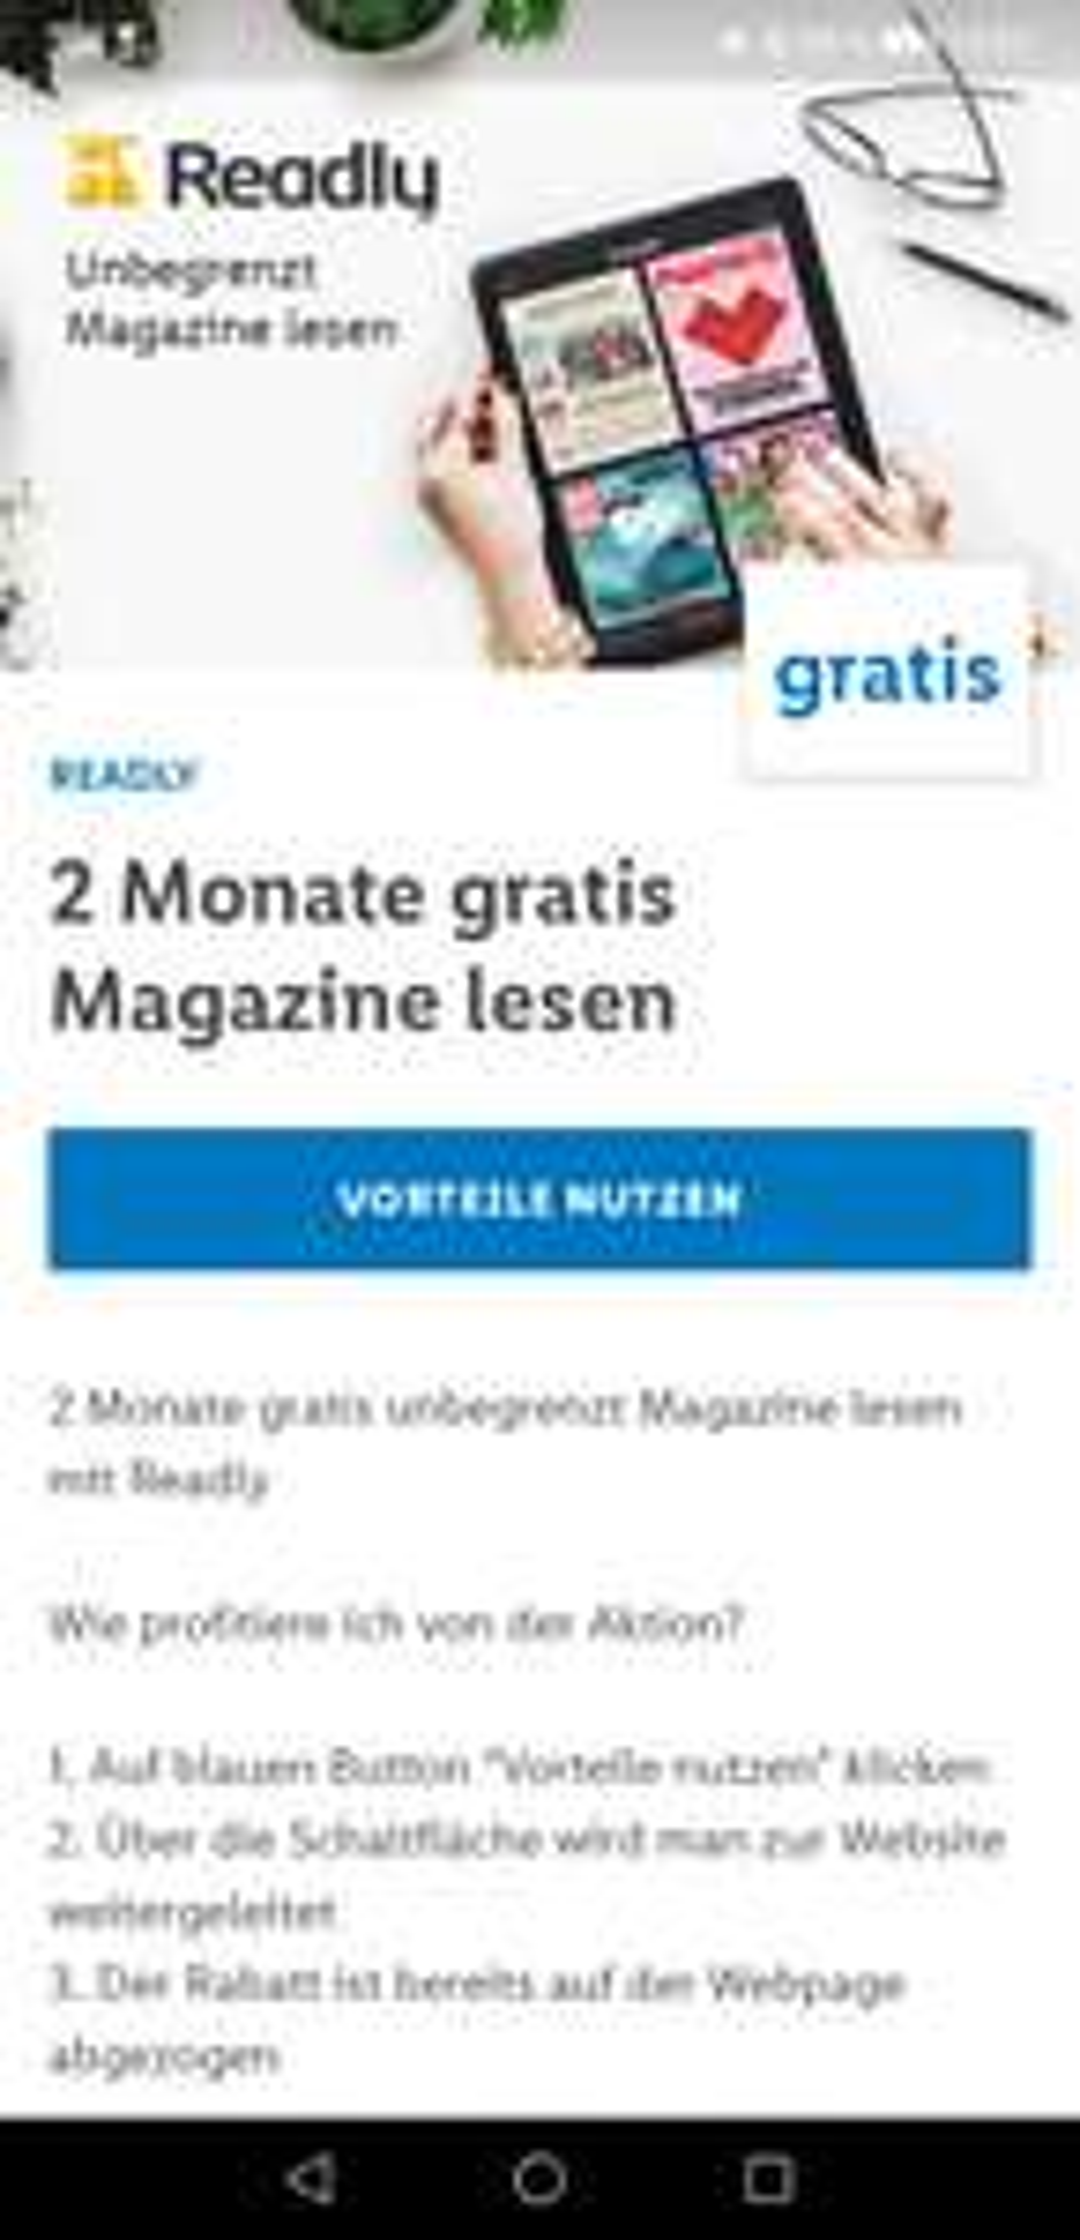 Lidl Plus und Readly: 2 Monate gratis Magazine lesen